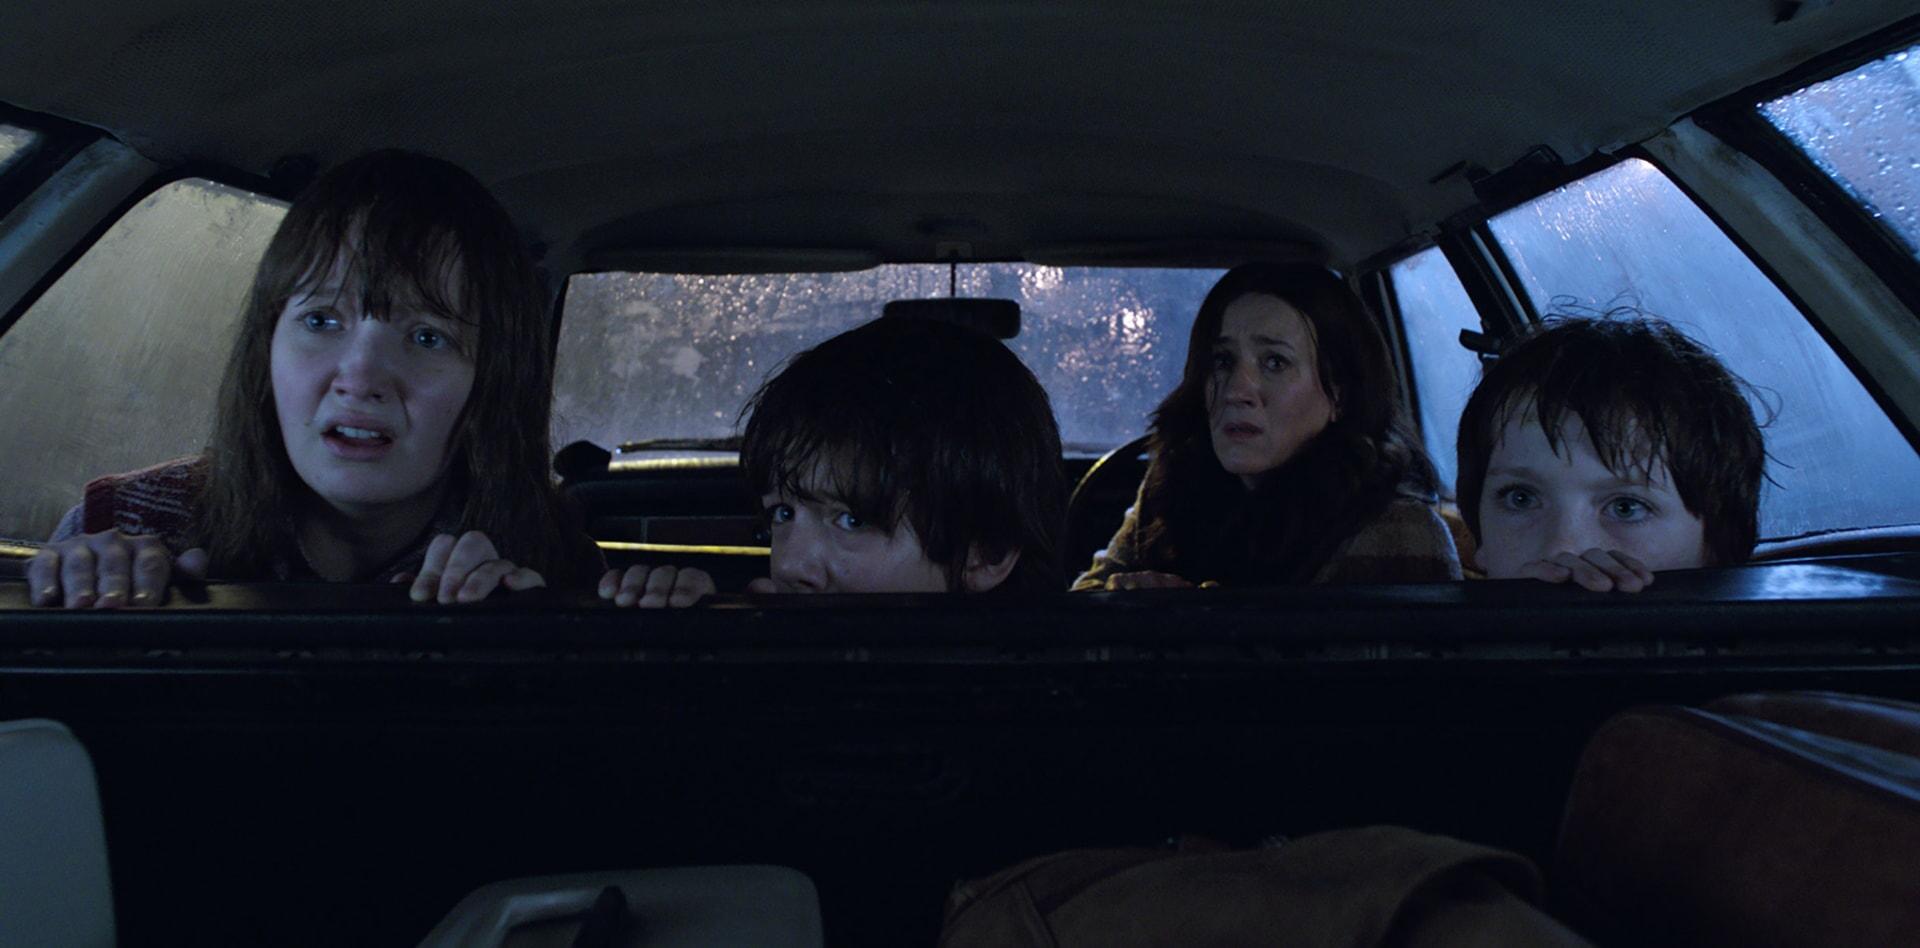 LAUREN ESPOSITO as Margaret Hodgson, PATRICK McAULEY as Johnny Hodgson, MARIA DOYLE KENNEDY as Peggy Nottingham and BENJAMIN HAIGH as Billy Hodgson in a car looking fearful